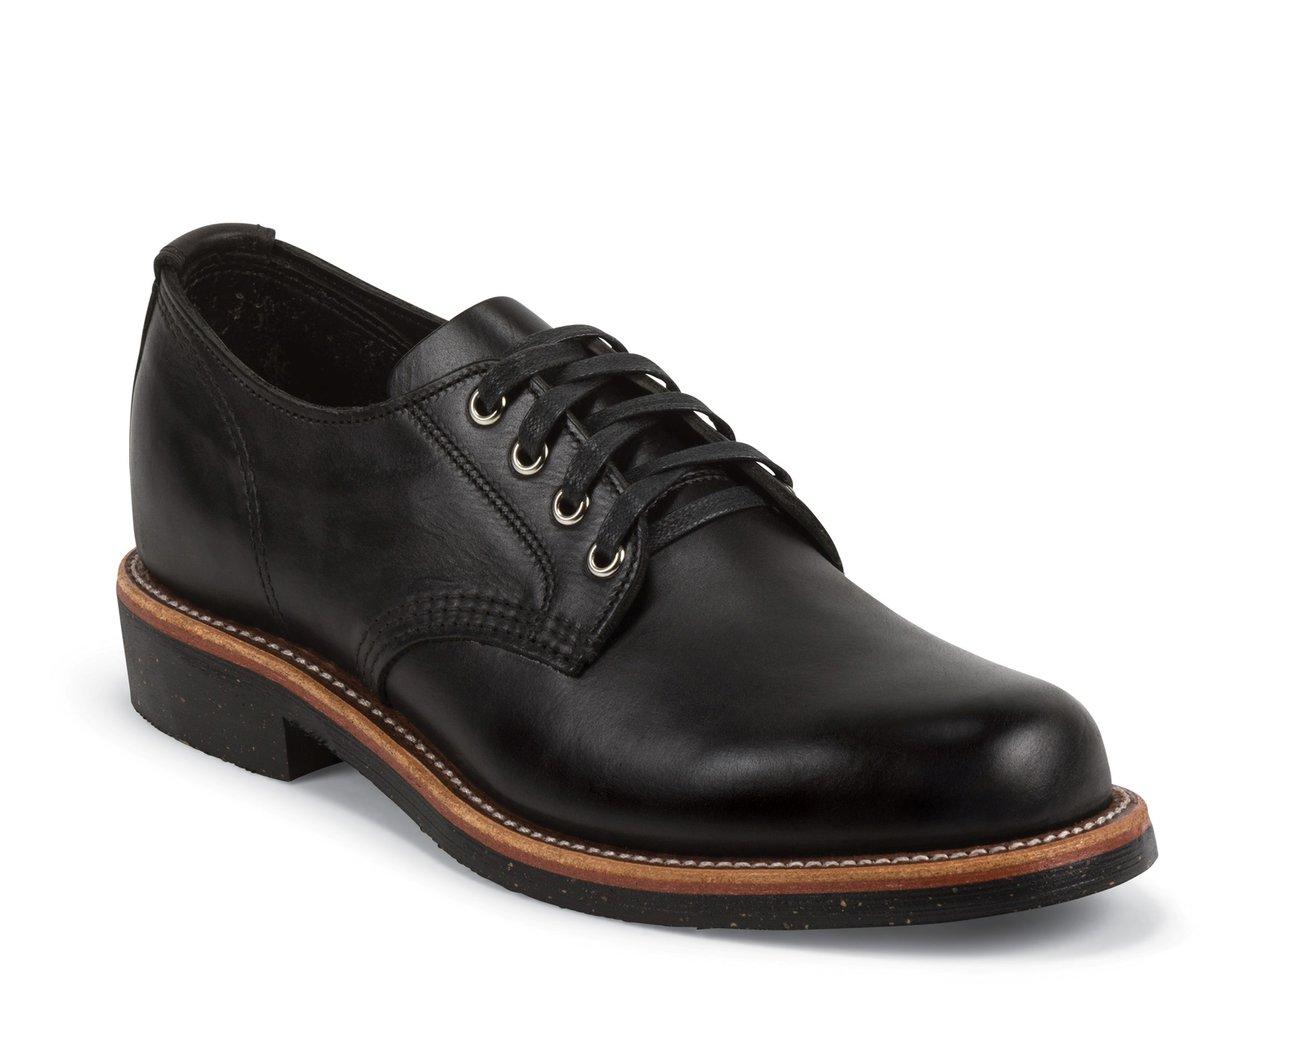 Chippewa Black Service Oxford Shoe